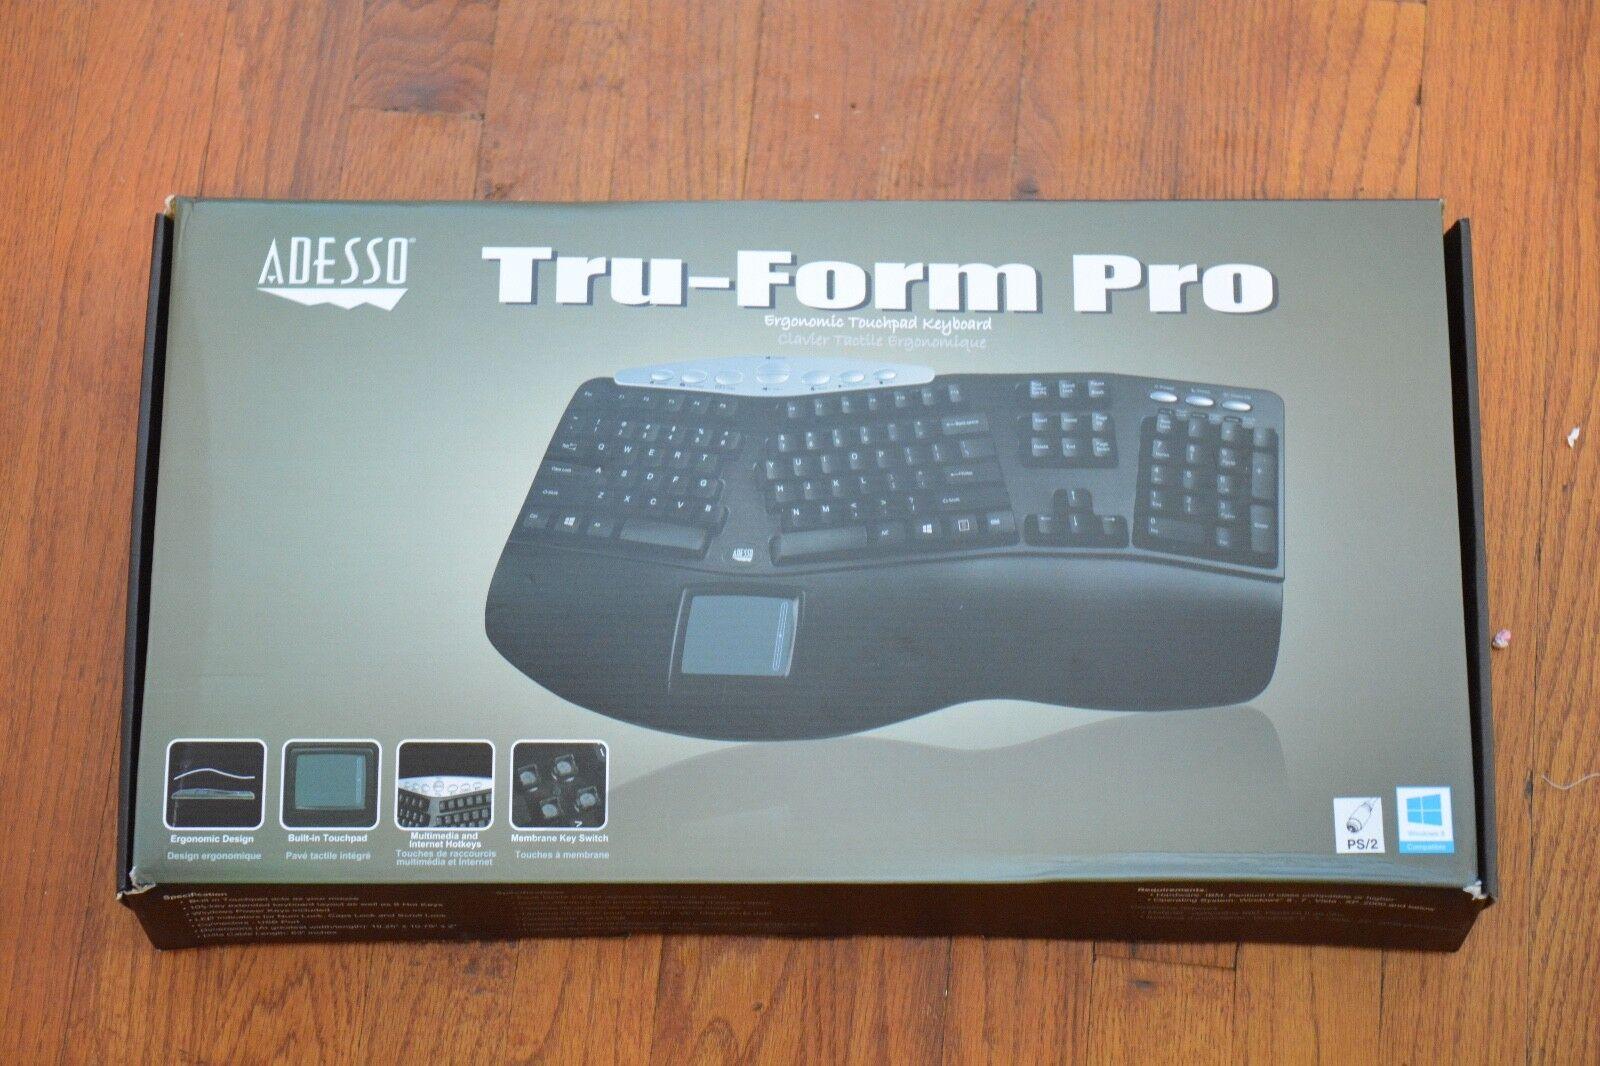 Adesso Tru-Form Pro PS/2 Ergonomic Contoured Multimedia Keyb